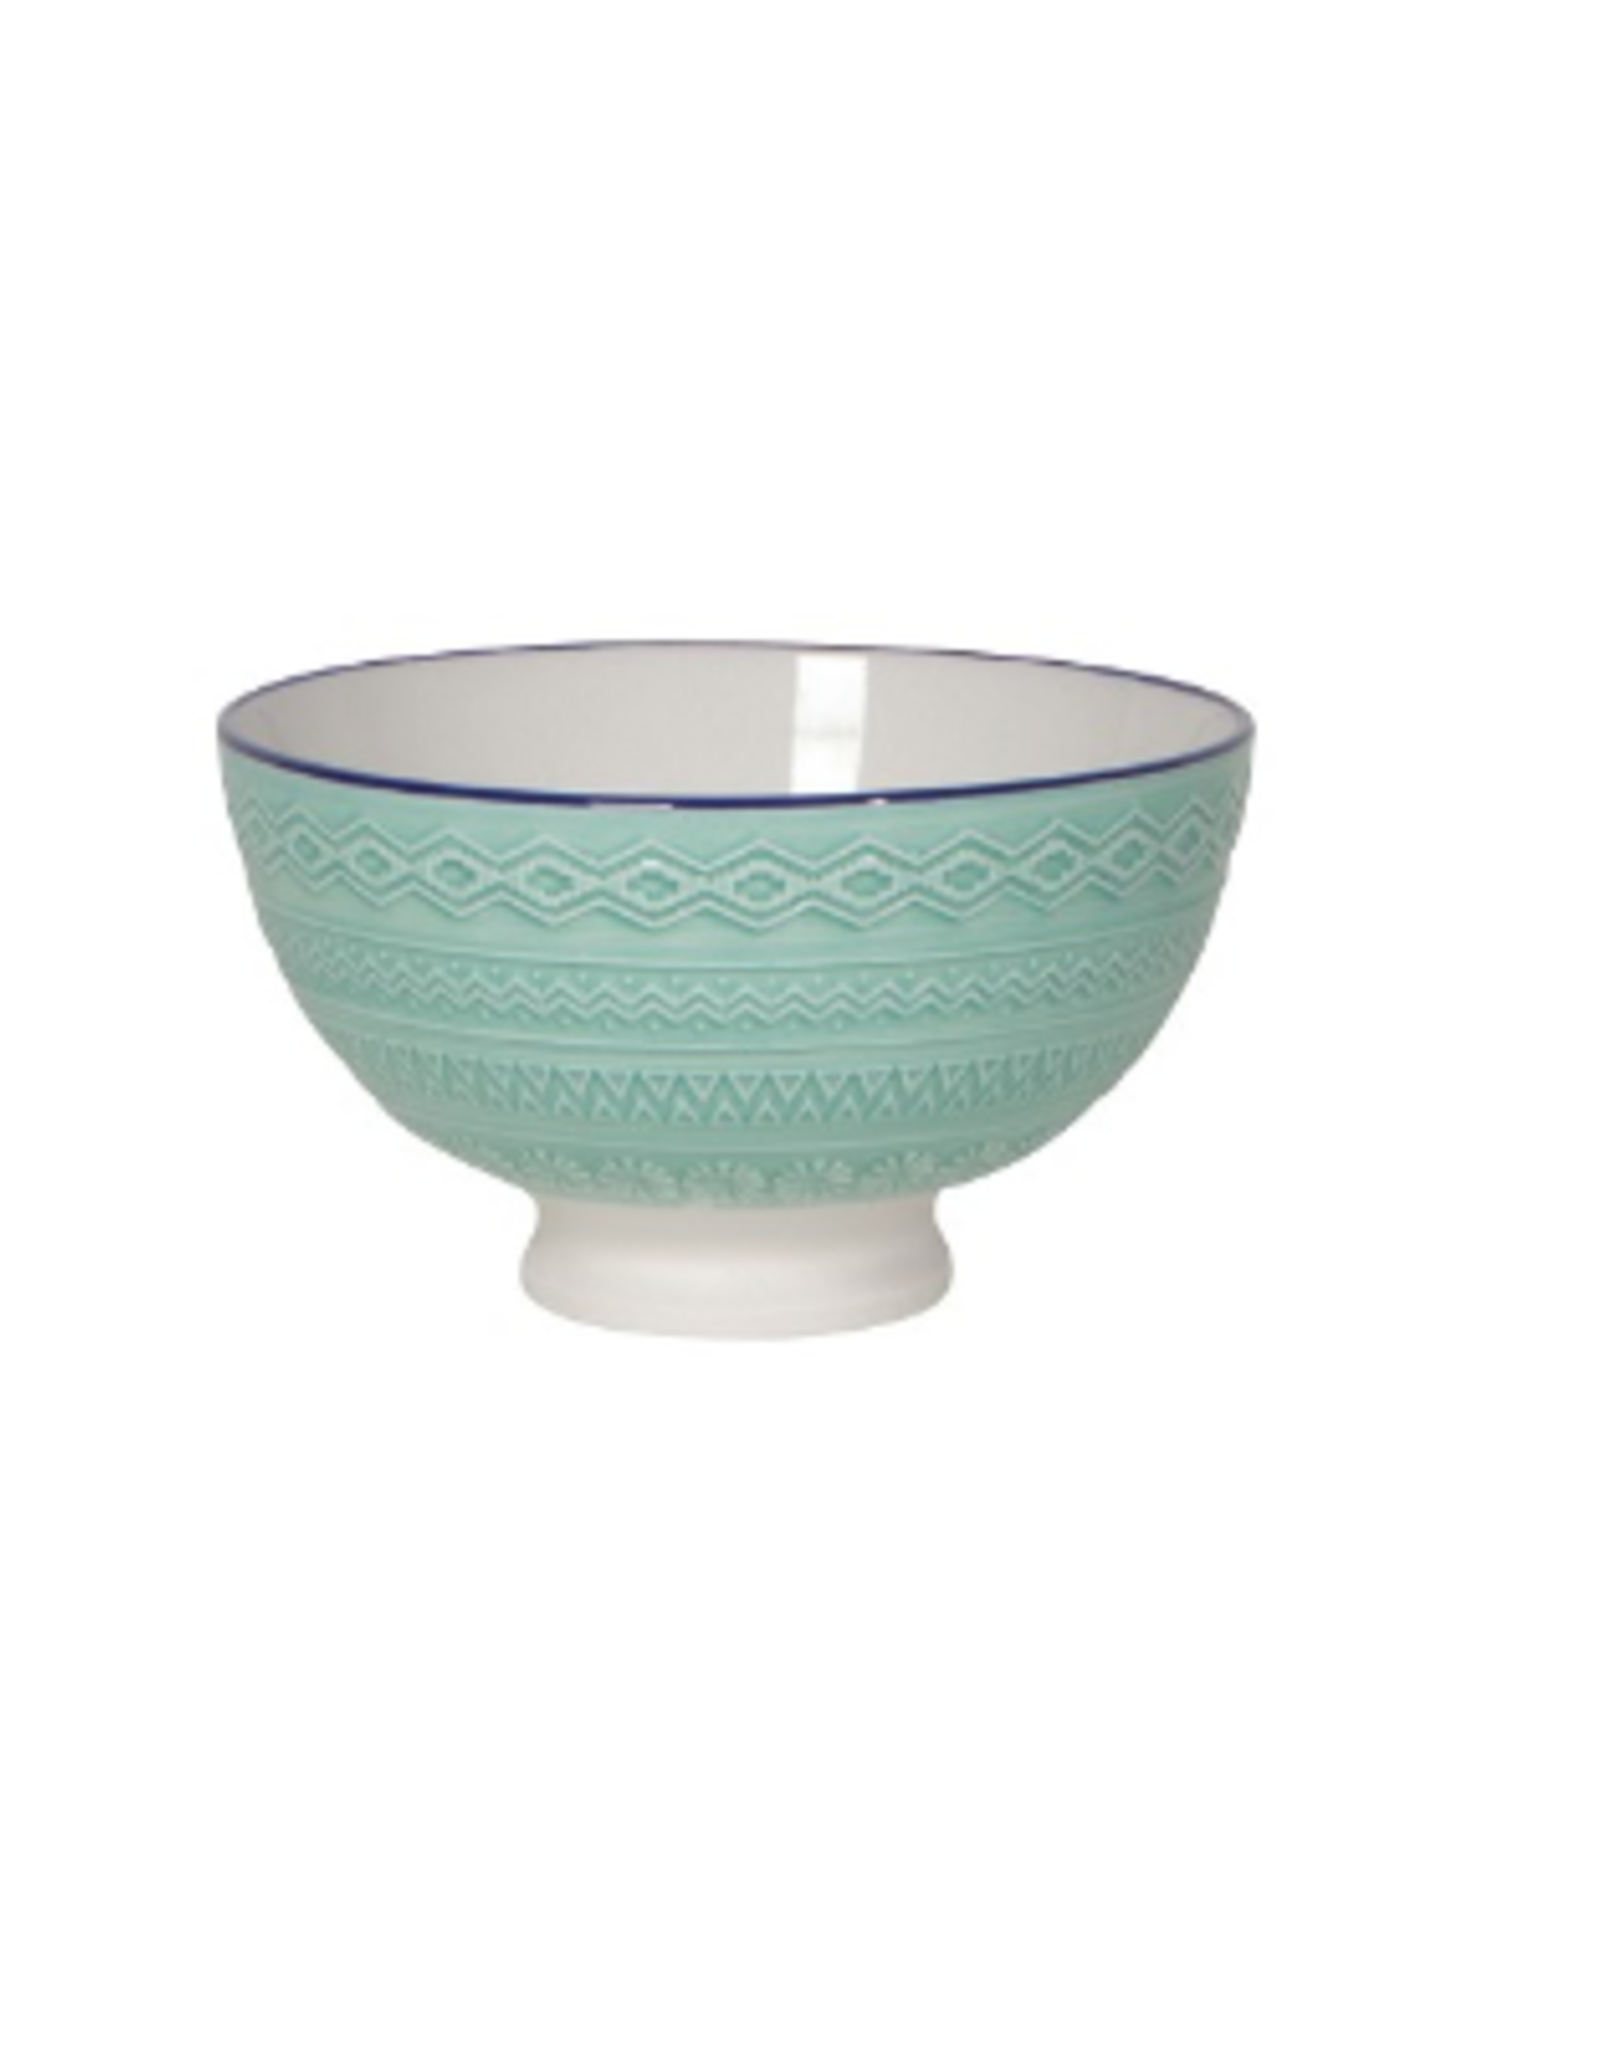 "Now Designs Morroccan Bowl, Dessert 4"""